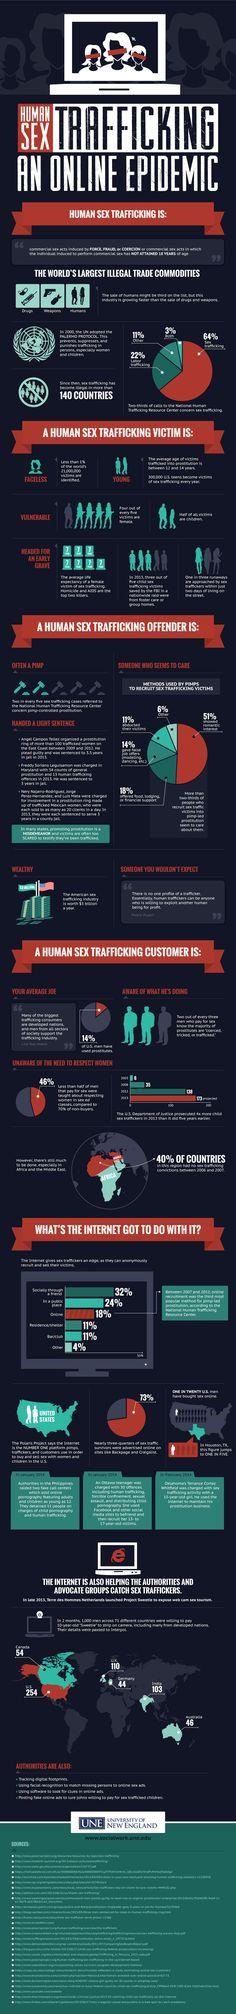 Human Sex Trafficking: An Online Epidemic